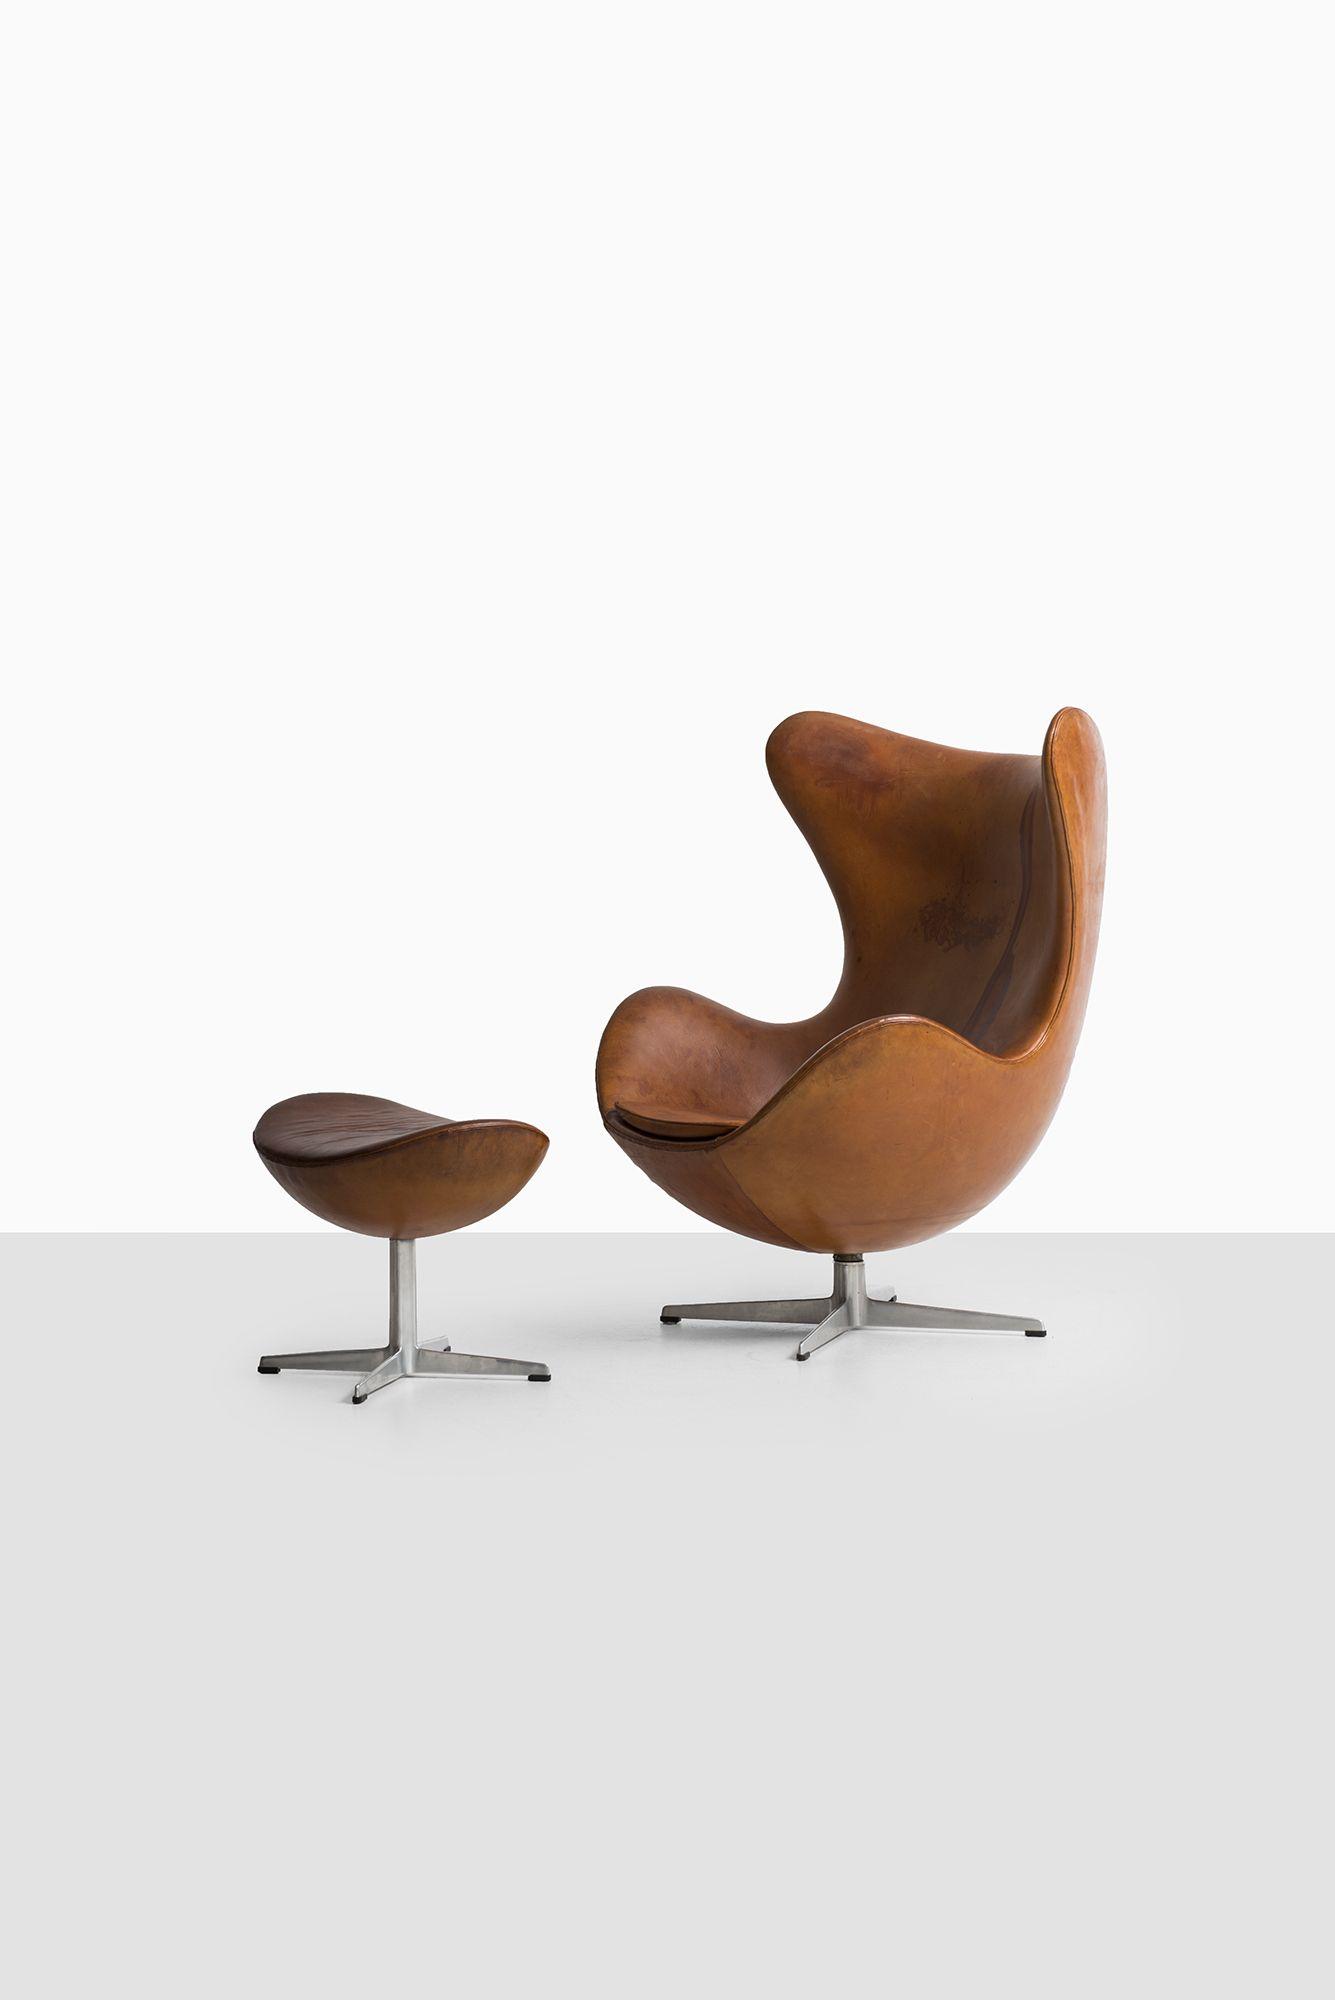 Jacobsen Egg Chair Leather Turquoise Task Arne Furniture Pinterest In Cognac Brown At Studio Schalling